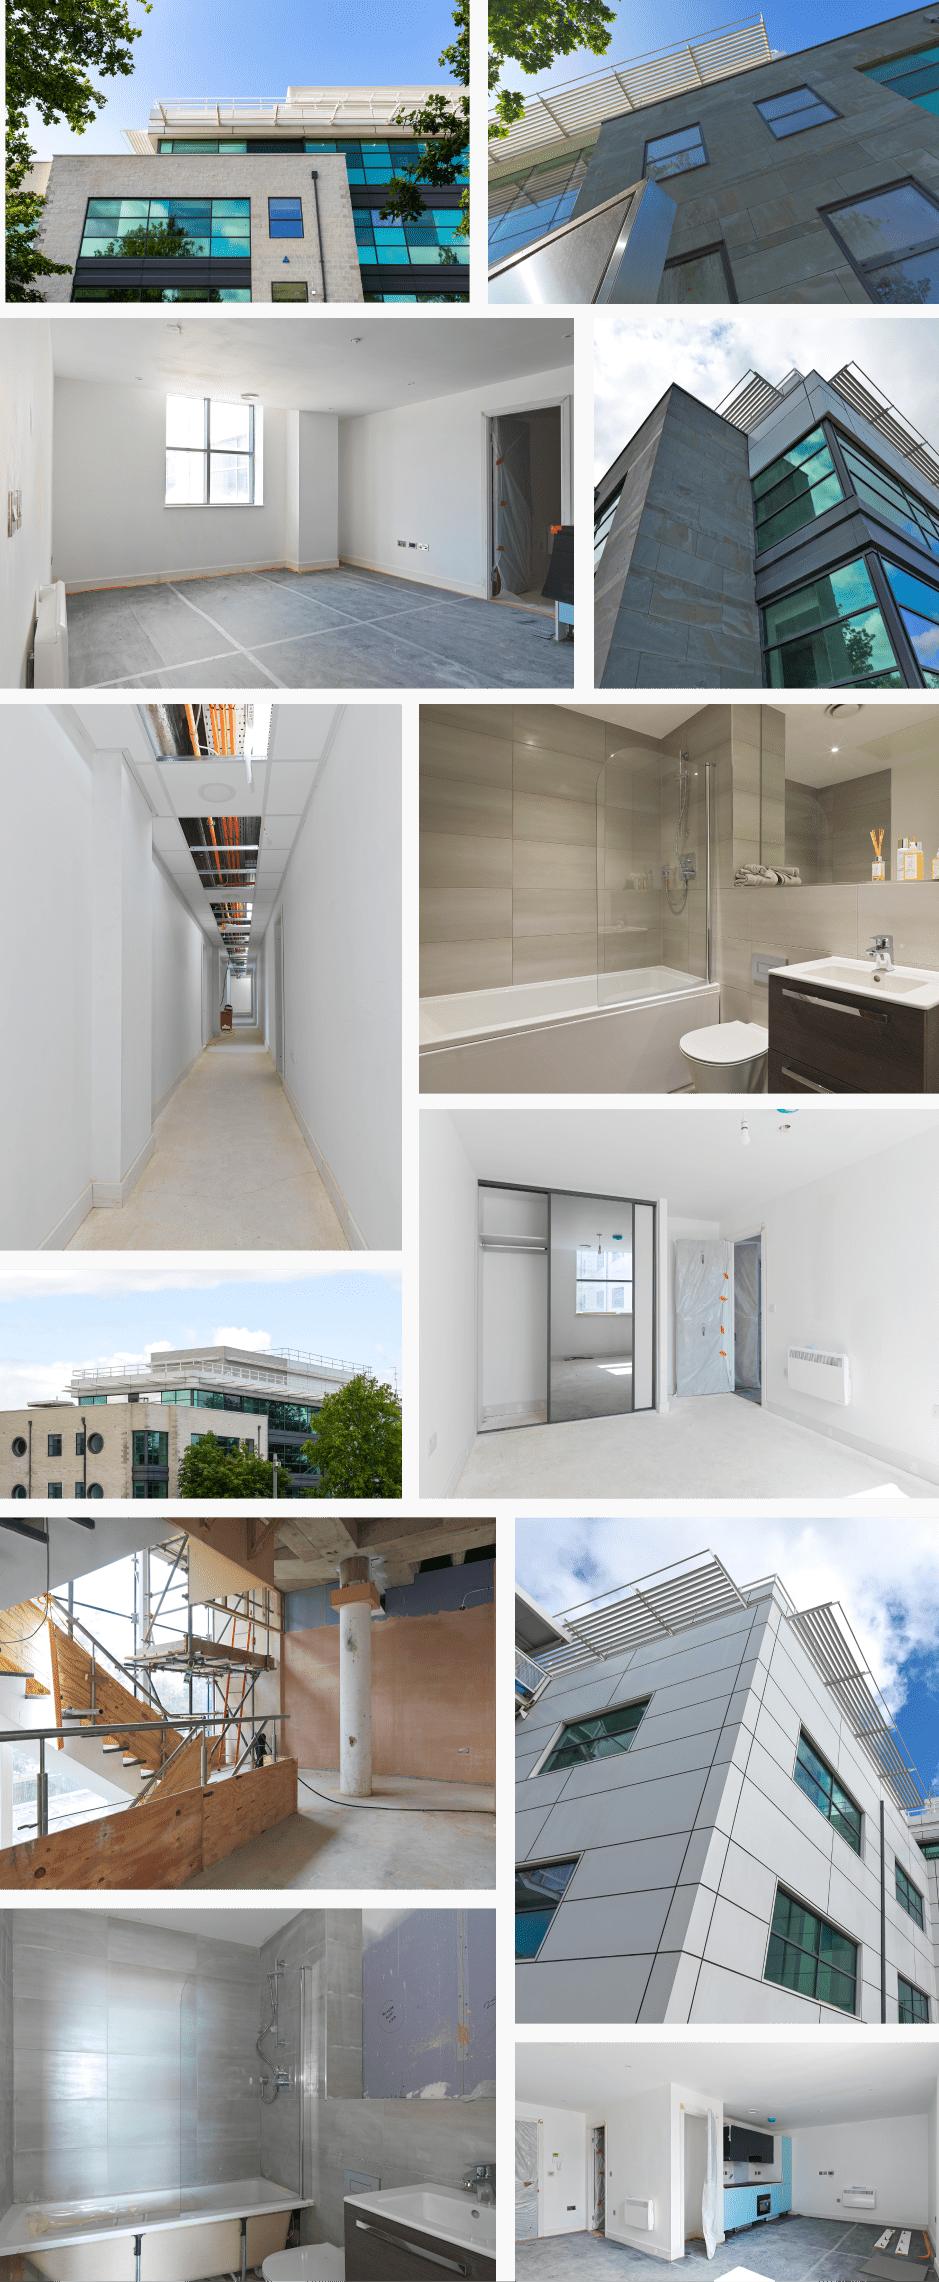 New Eton House build update